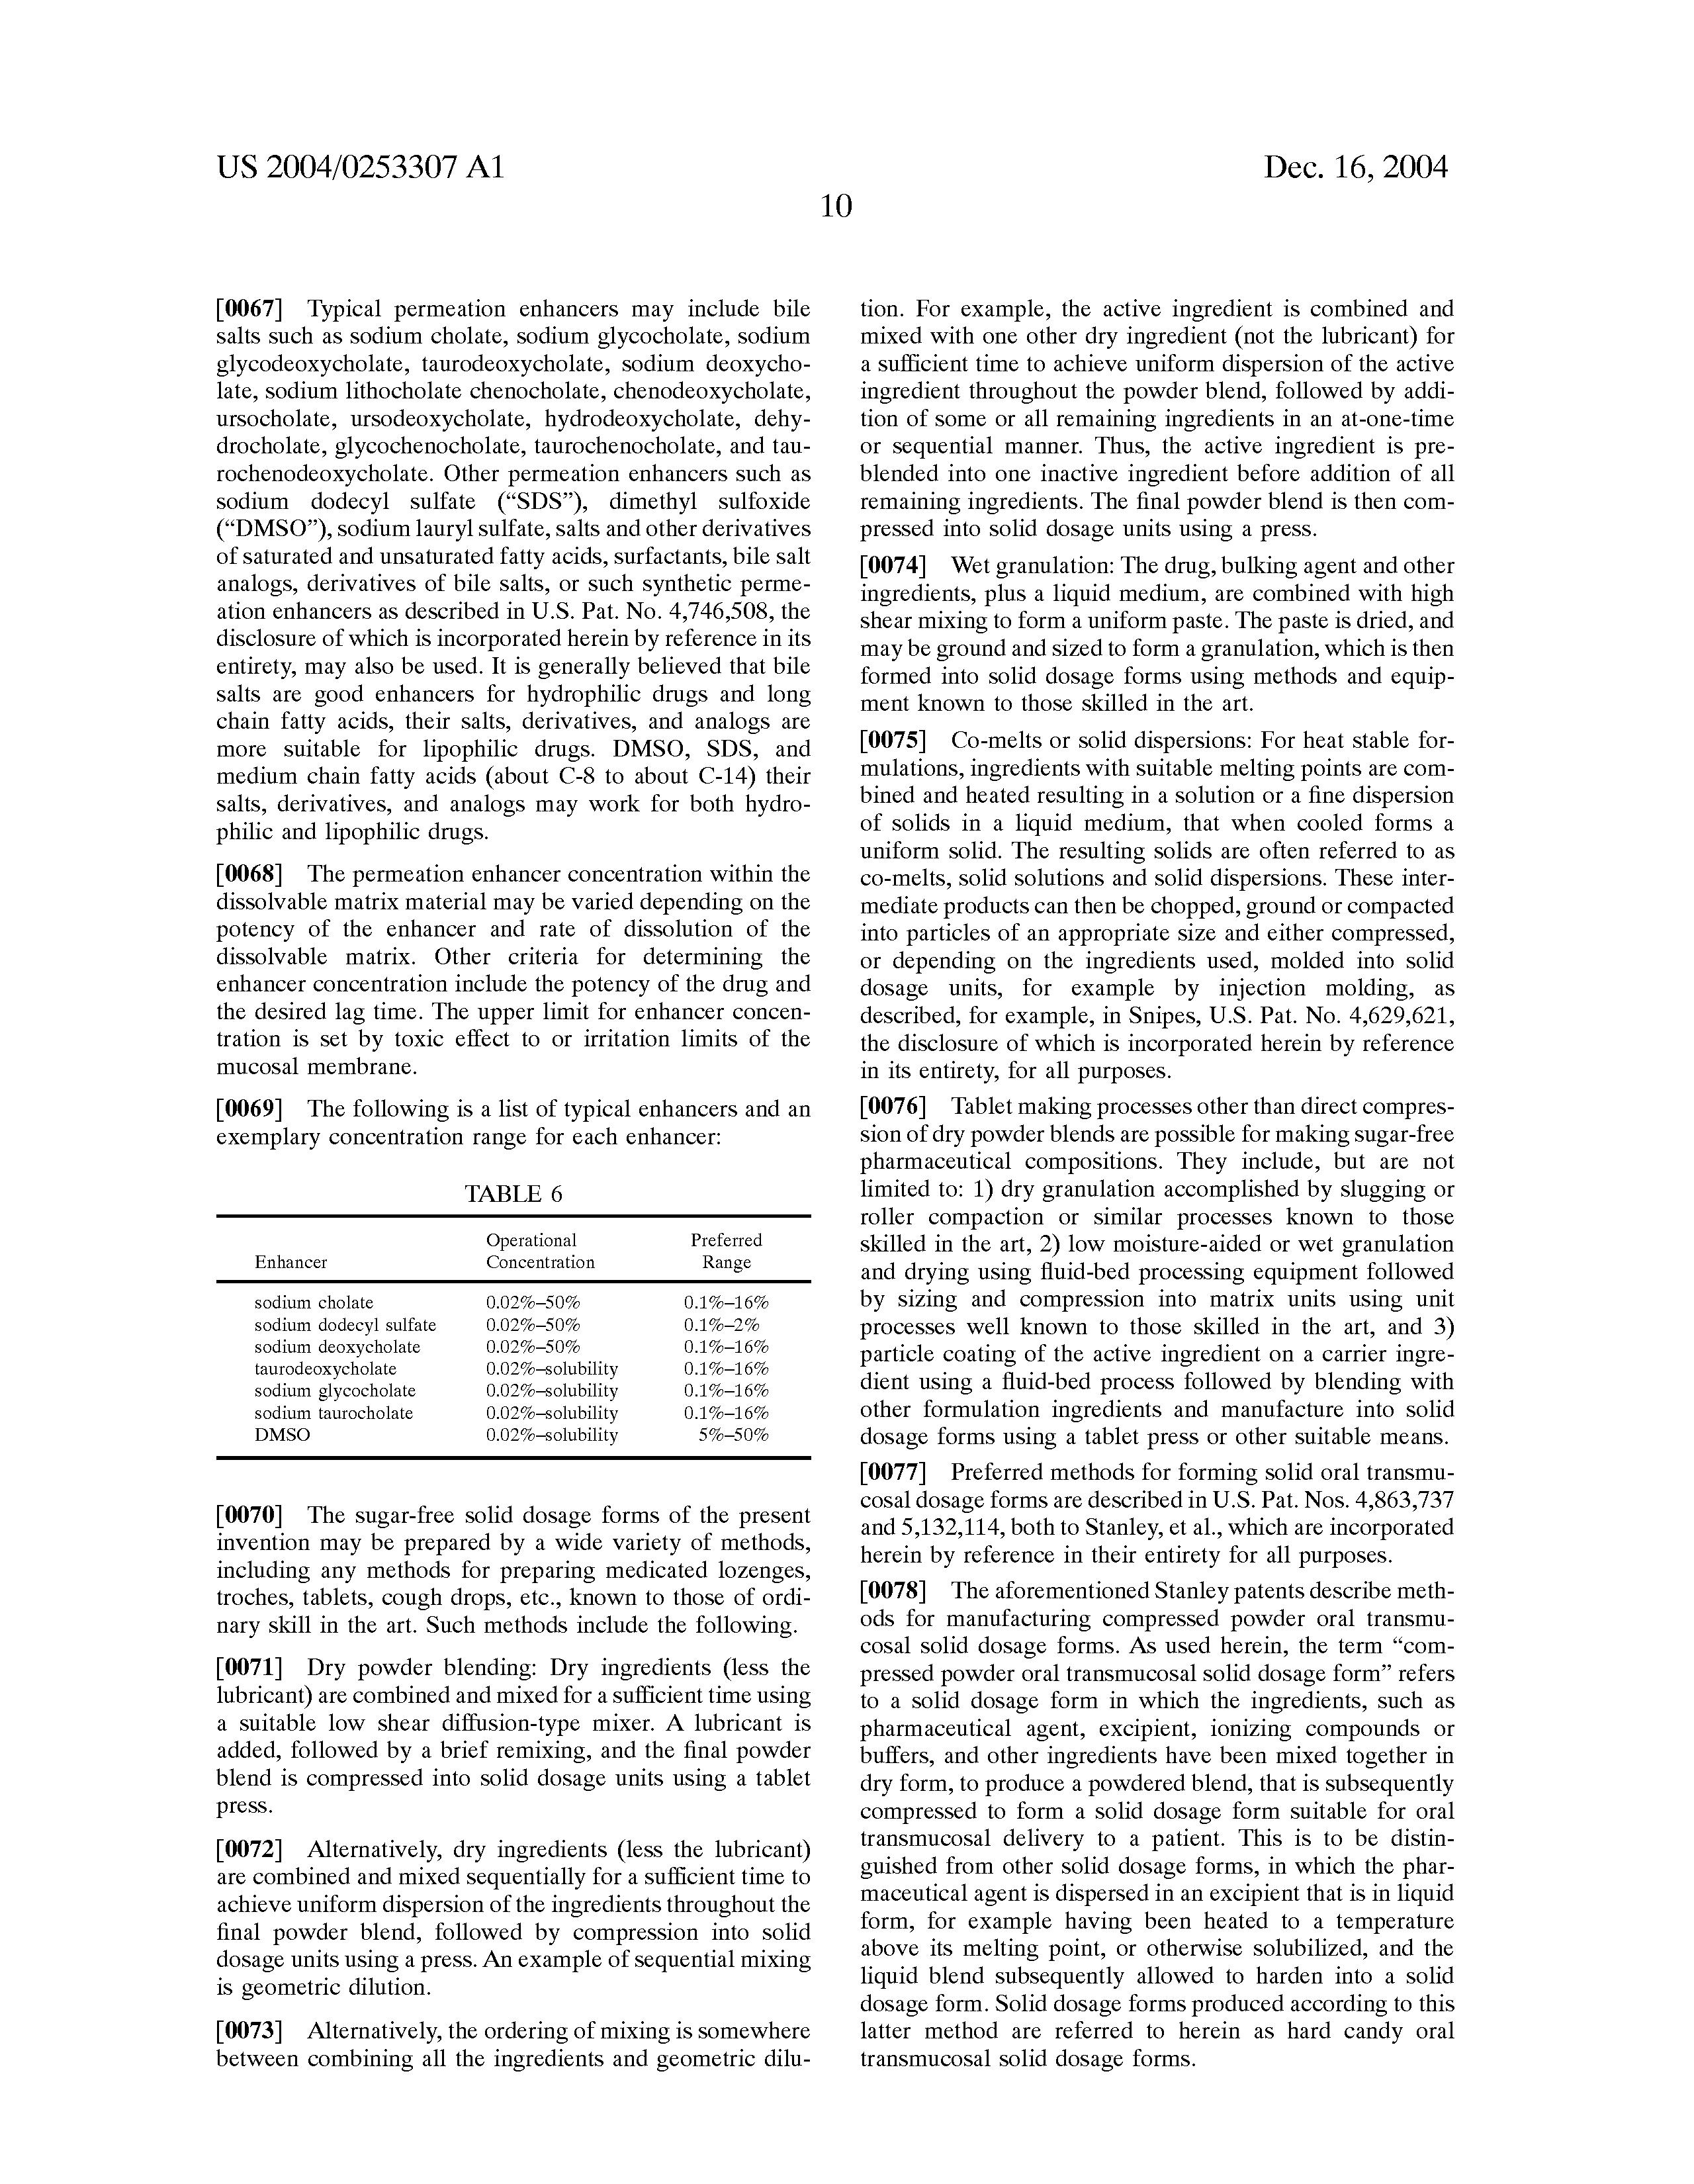 Aspecton hustensaft dosierung ciprofloxacin